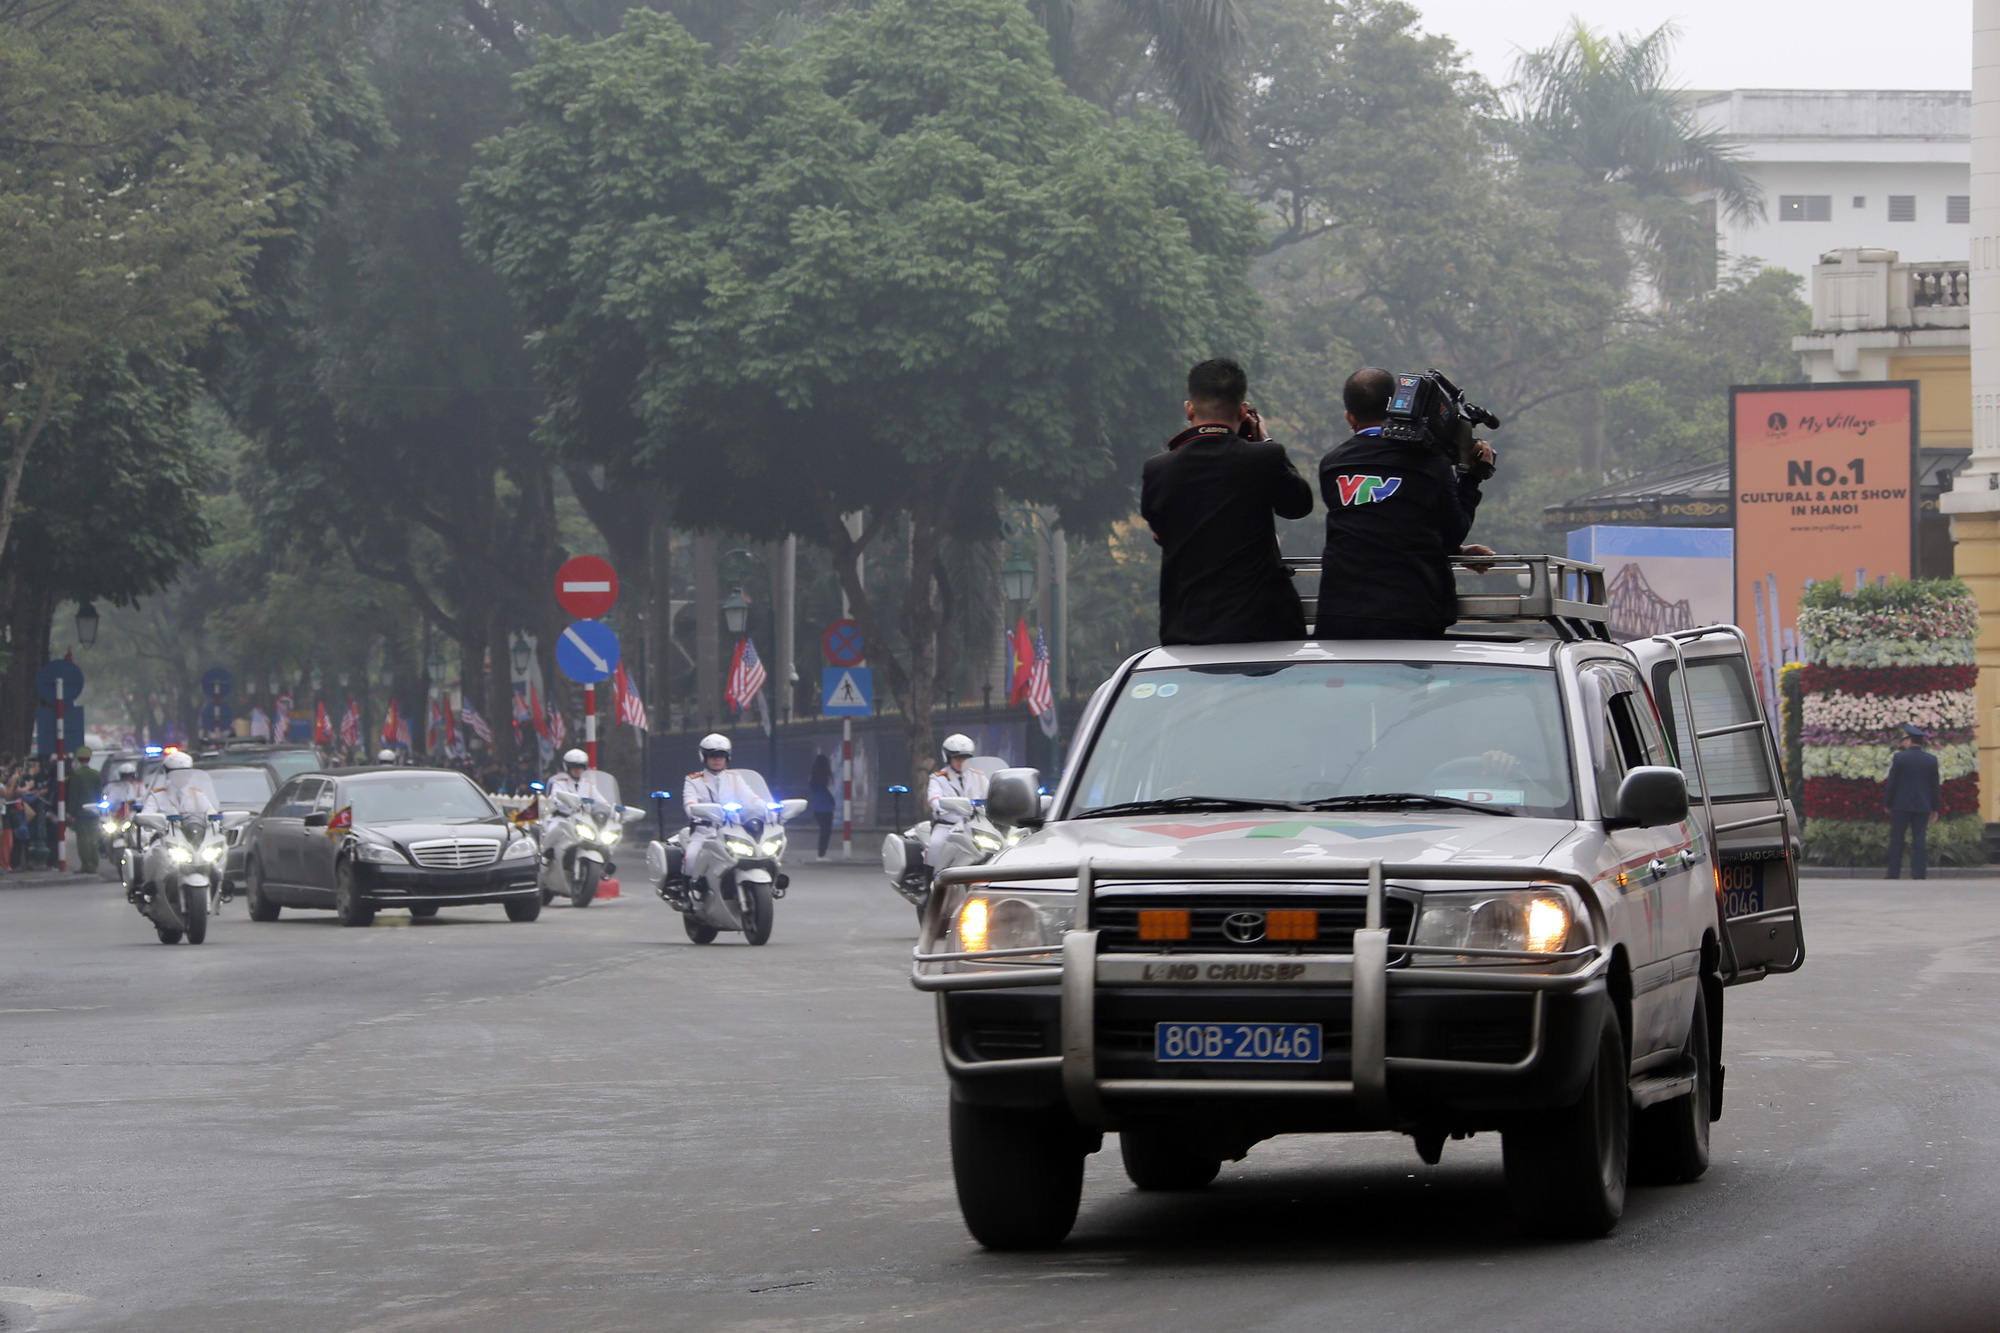 Phong vien Dai THVN theo sat doan xe cho Chu tich Kim Jong Un